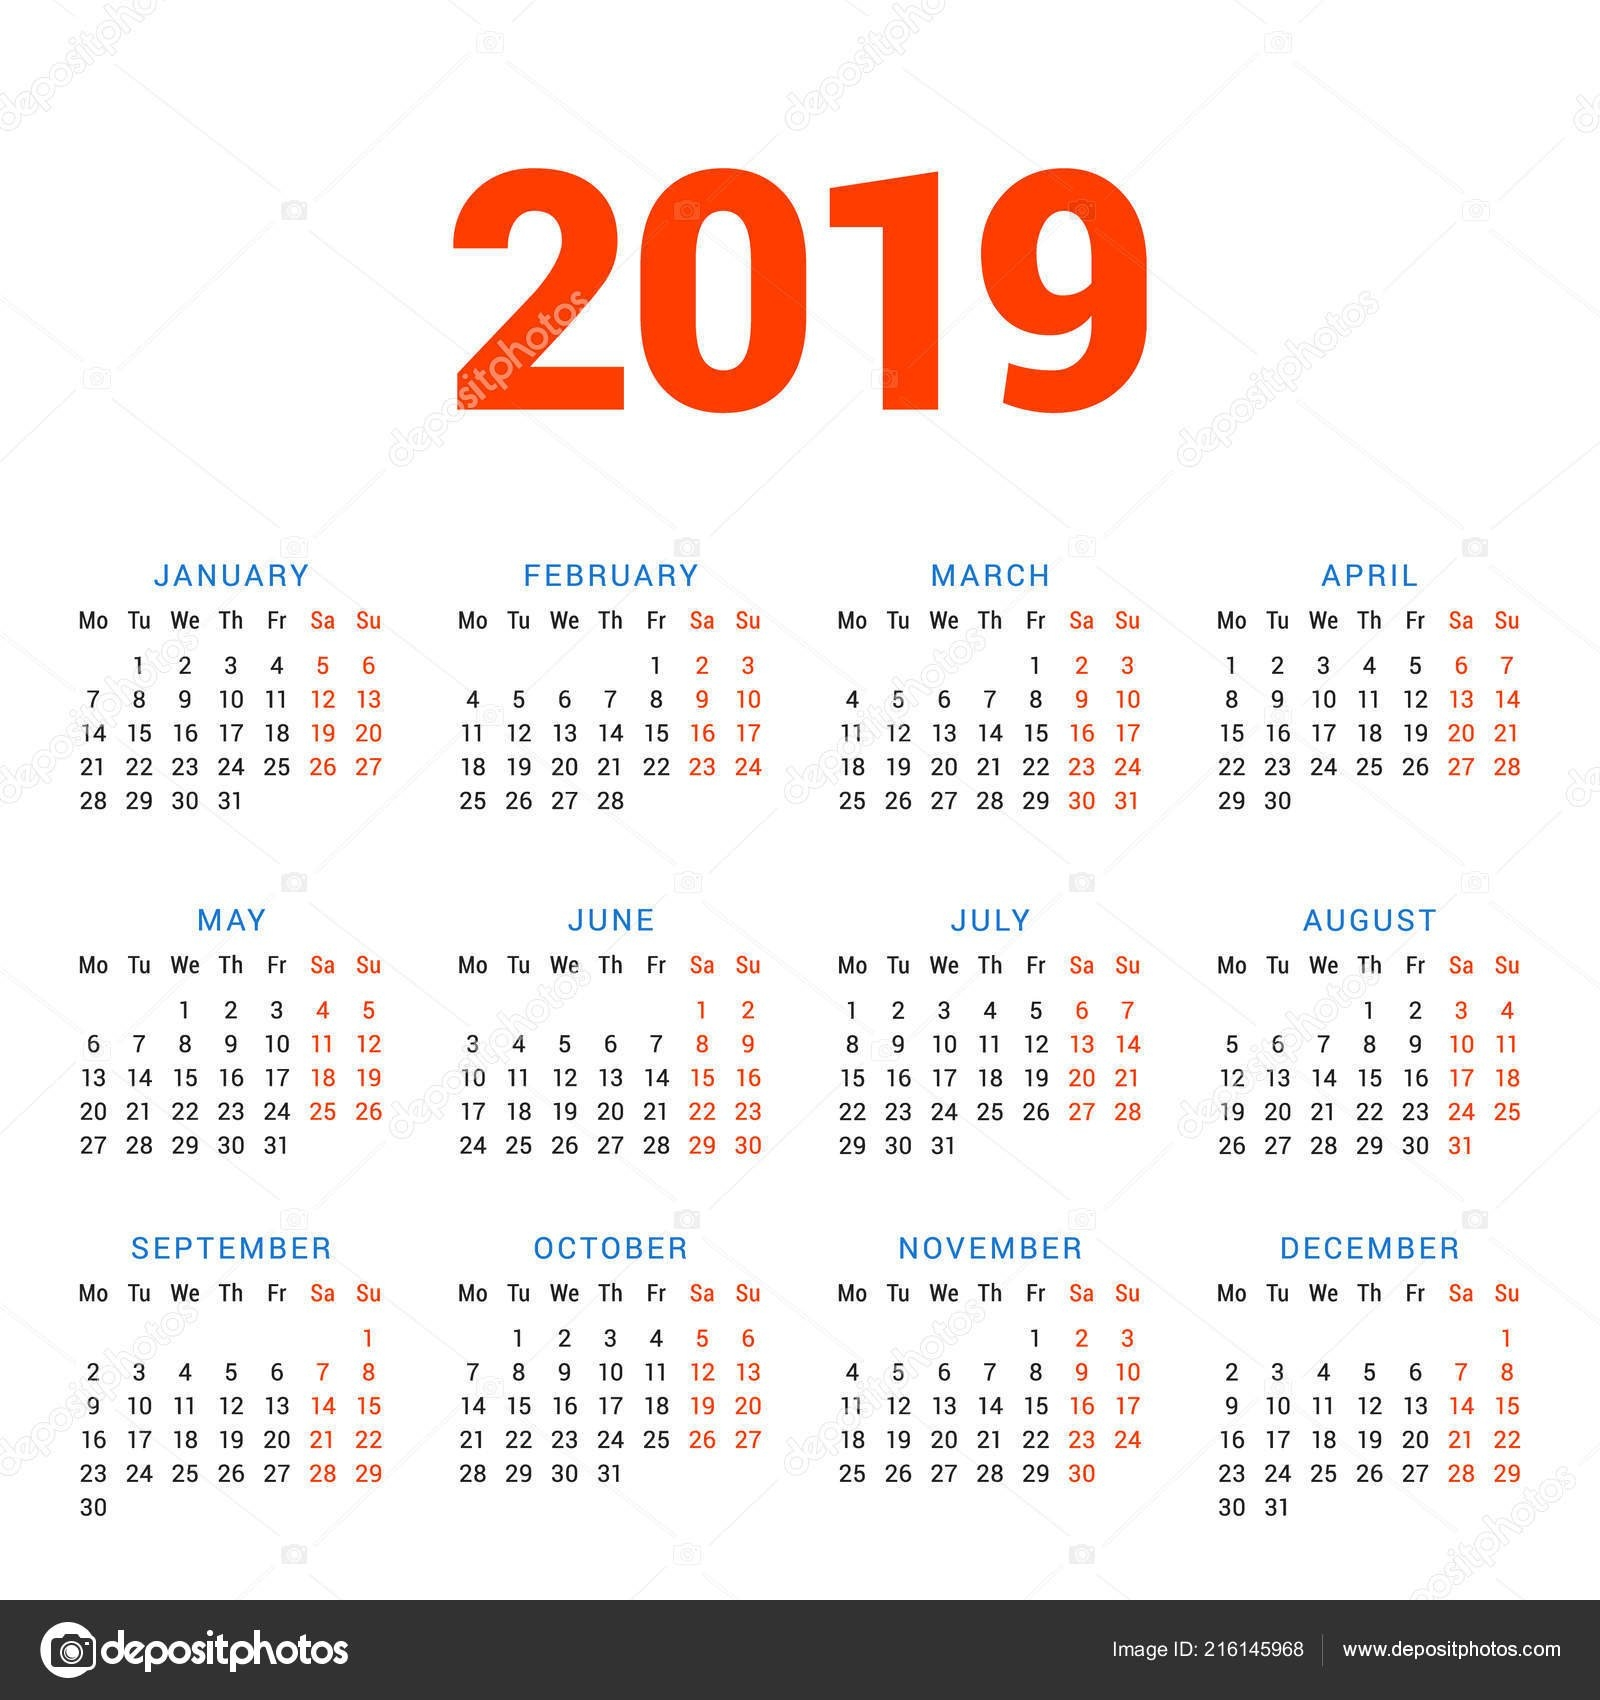 Calendar 2019 Year White Background Week Starts Monday Columns Rows 4 Column Calendar 2019